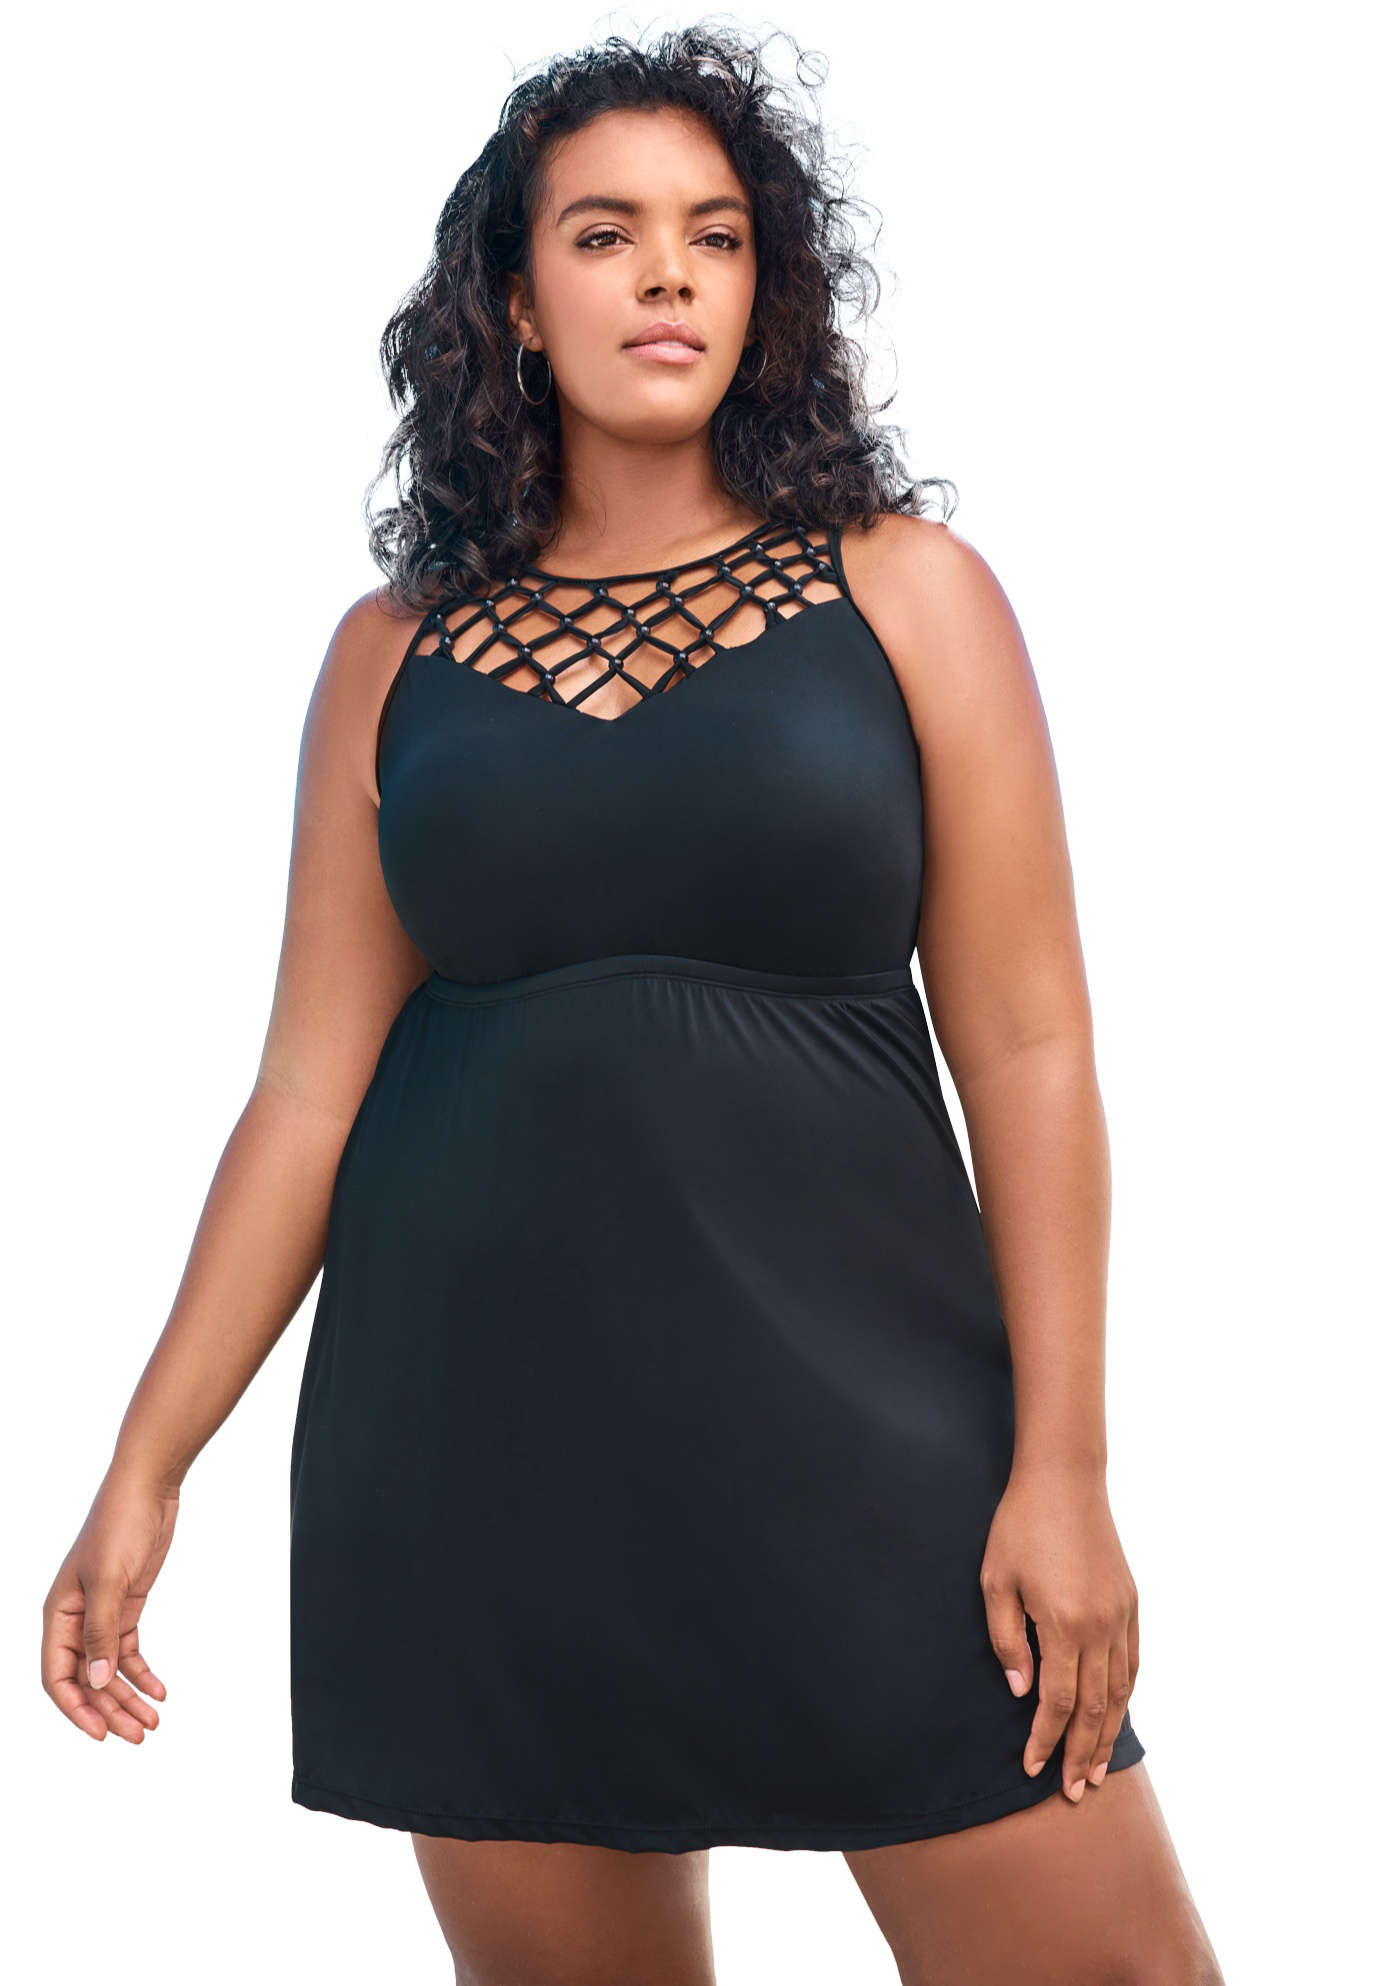 Plus Size Women's Beaded Macrame Swim Dress by Swim 365 in Black